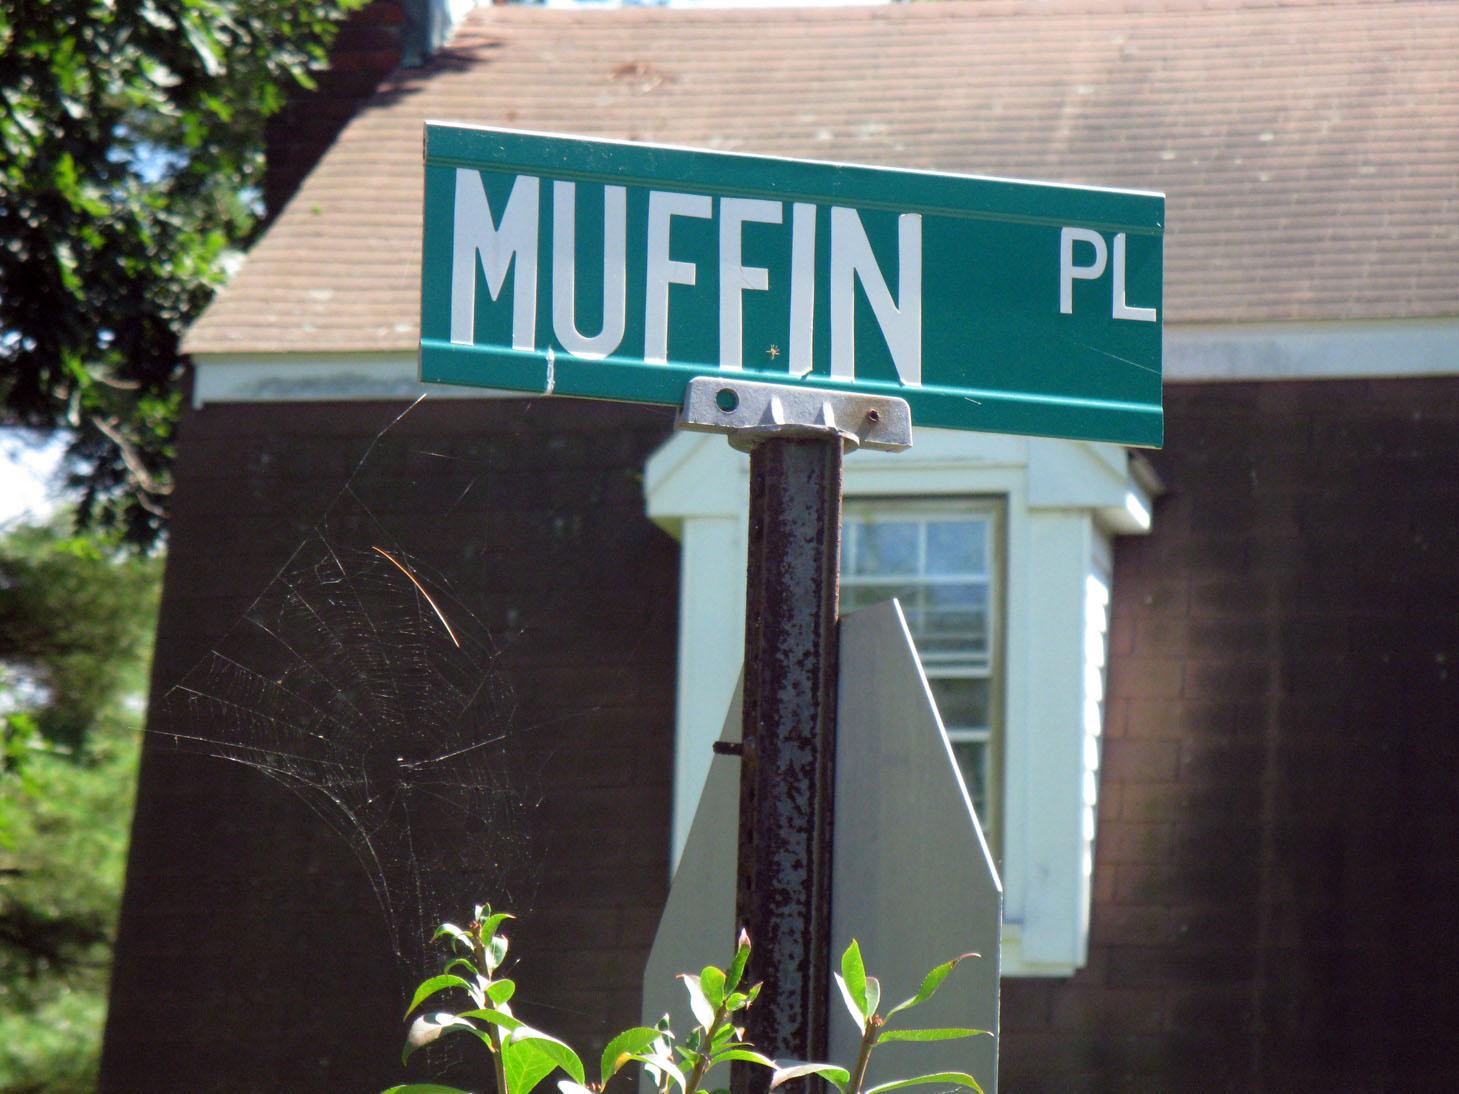 http://2.bp.blogspot.com/-1T9WQjdtr1E/UMUGlmiRhDI/AAAAAAAAINw/hecIyOJMyQI/s1600/muffin+place.jpg